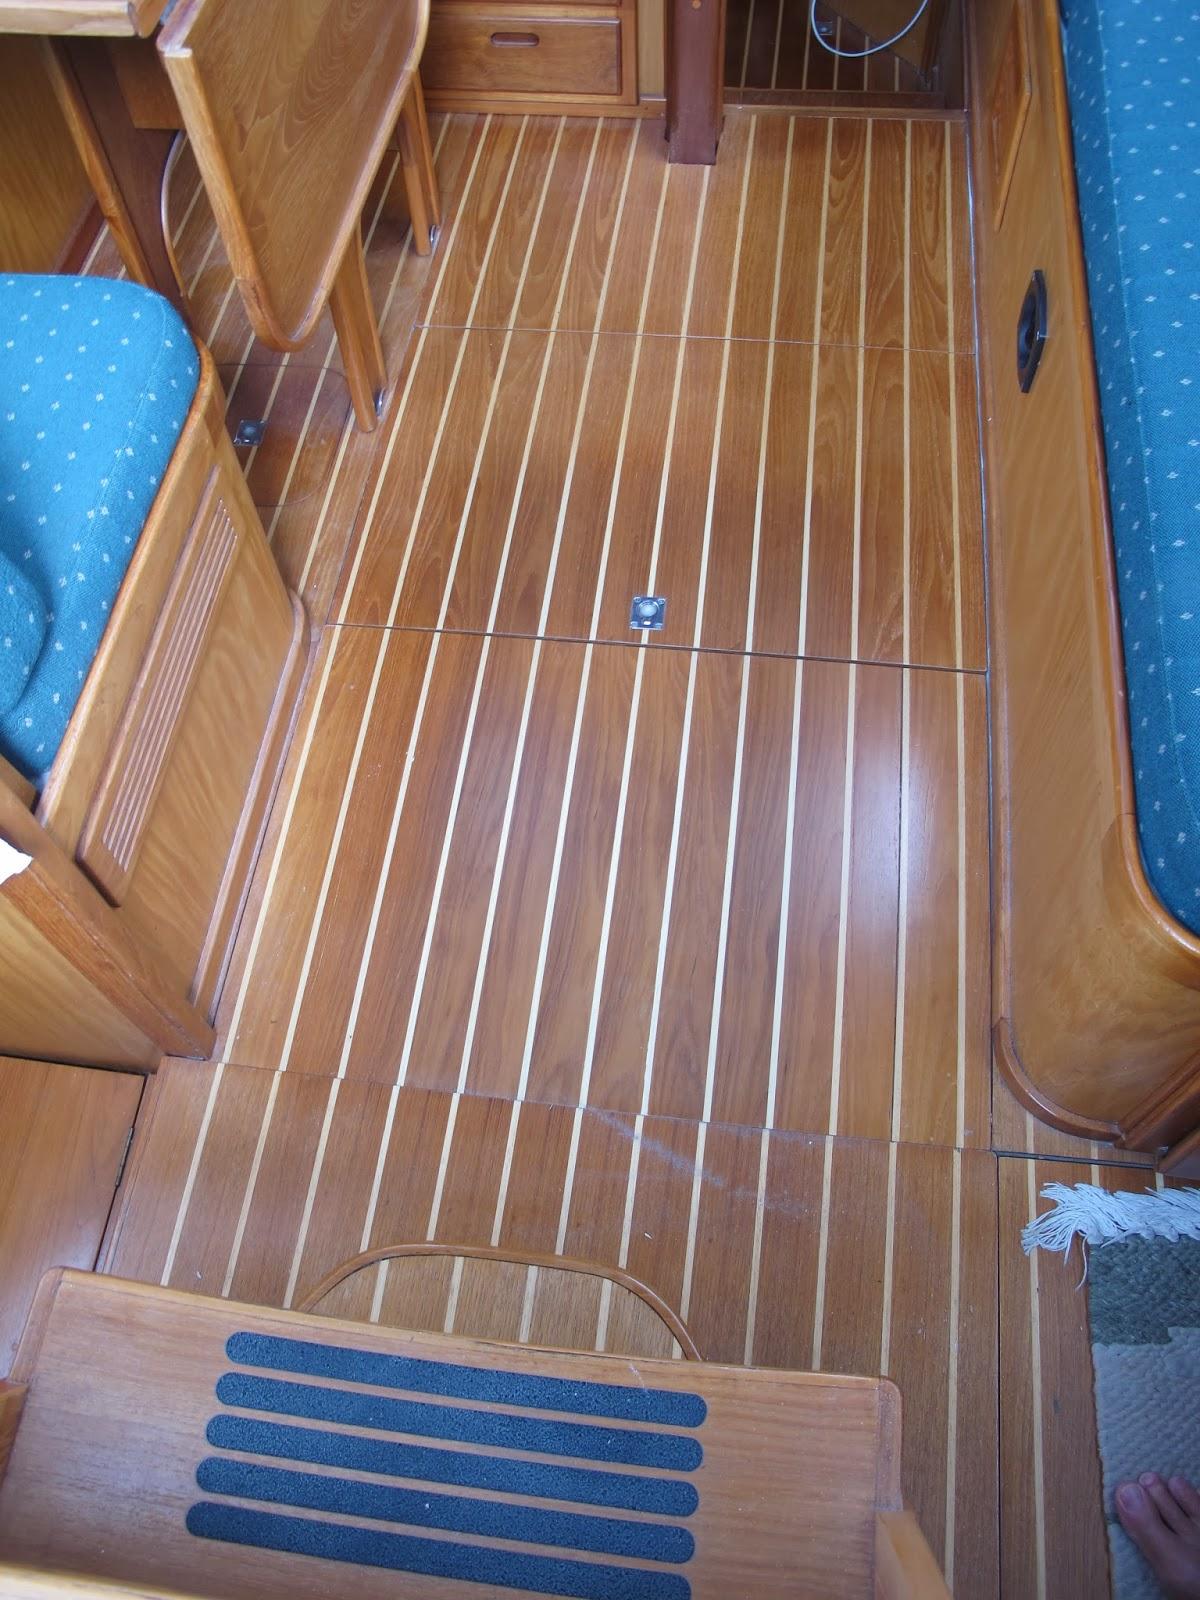 CKD Boats - Roy Mc Bride: Teak and Ash boat flooring